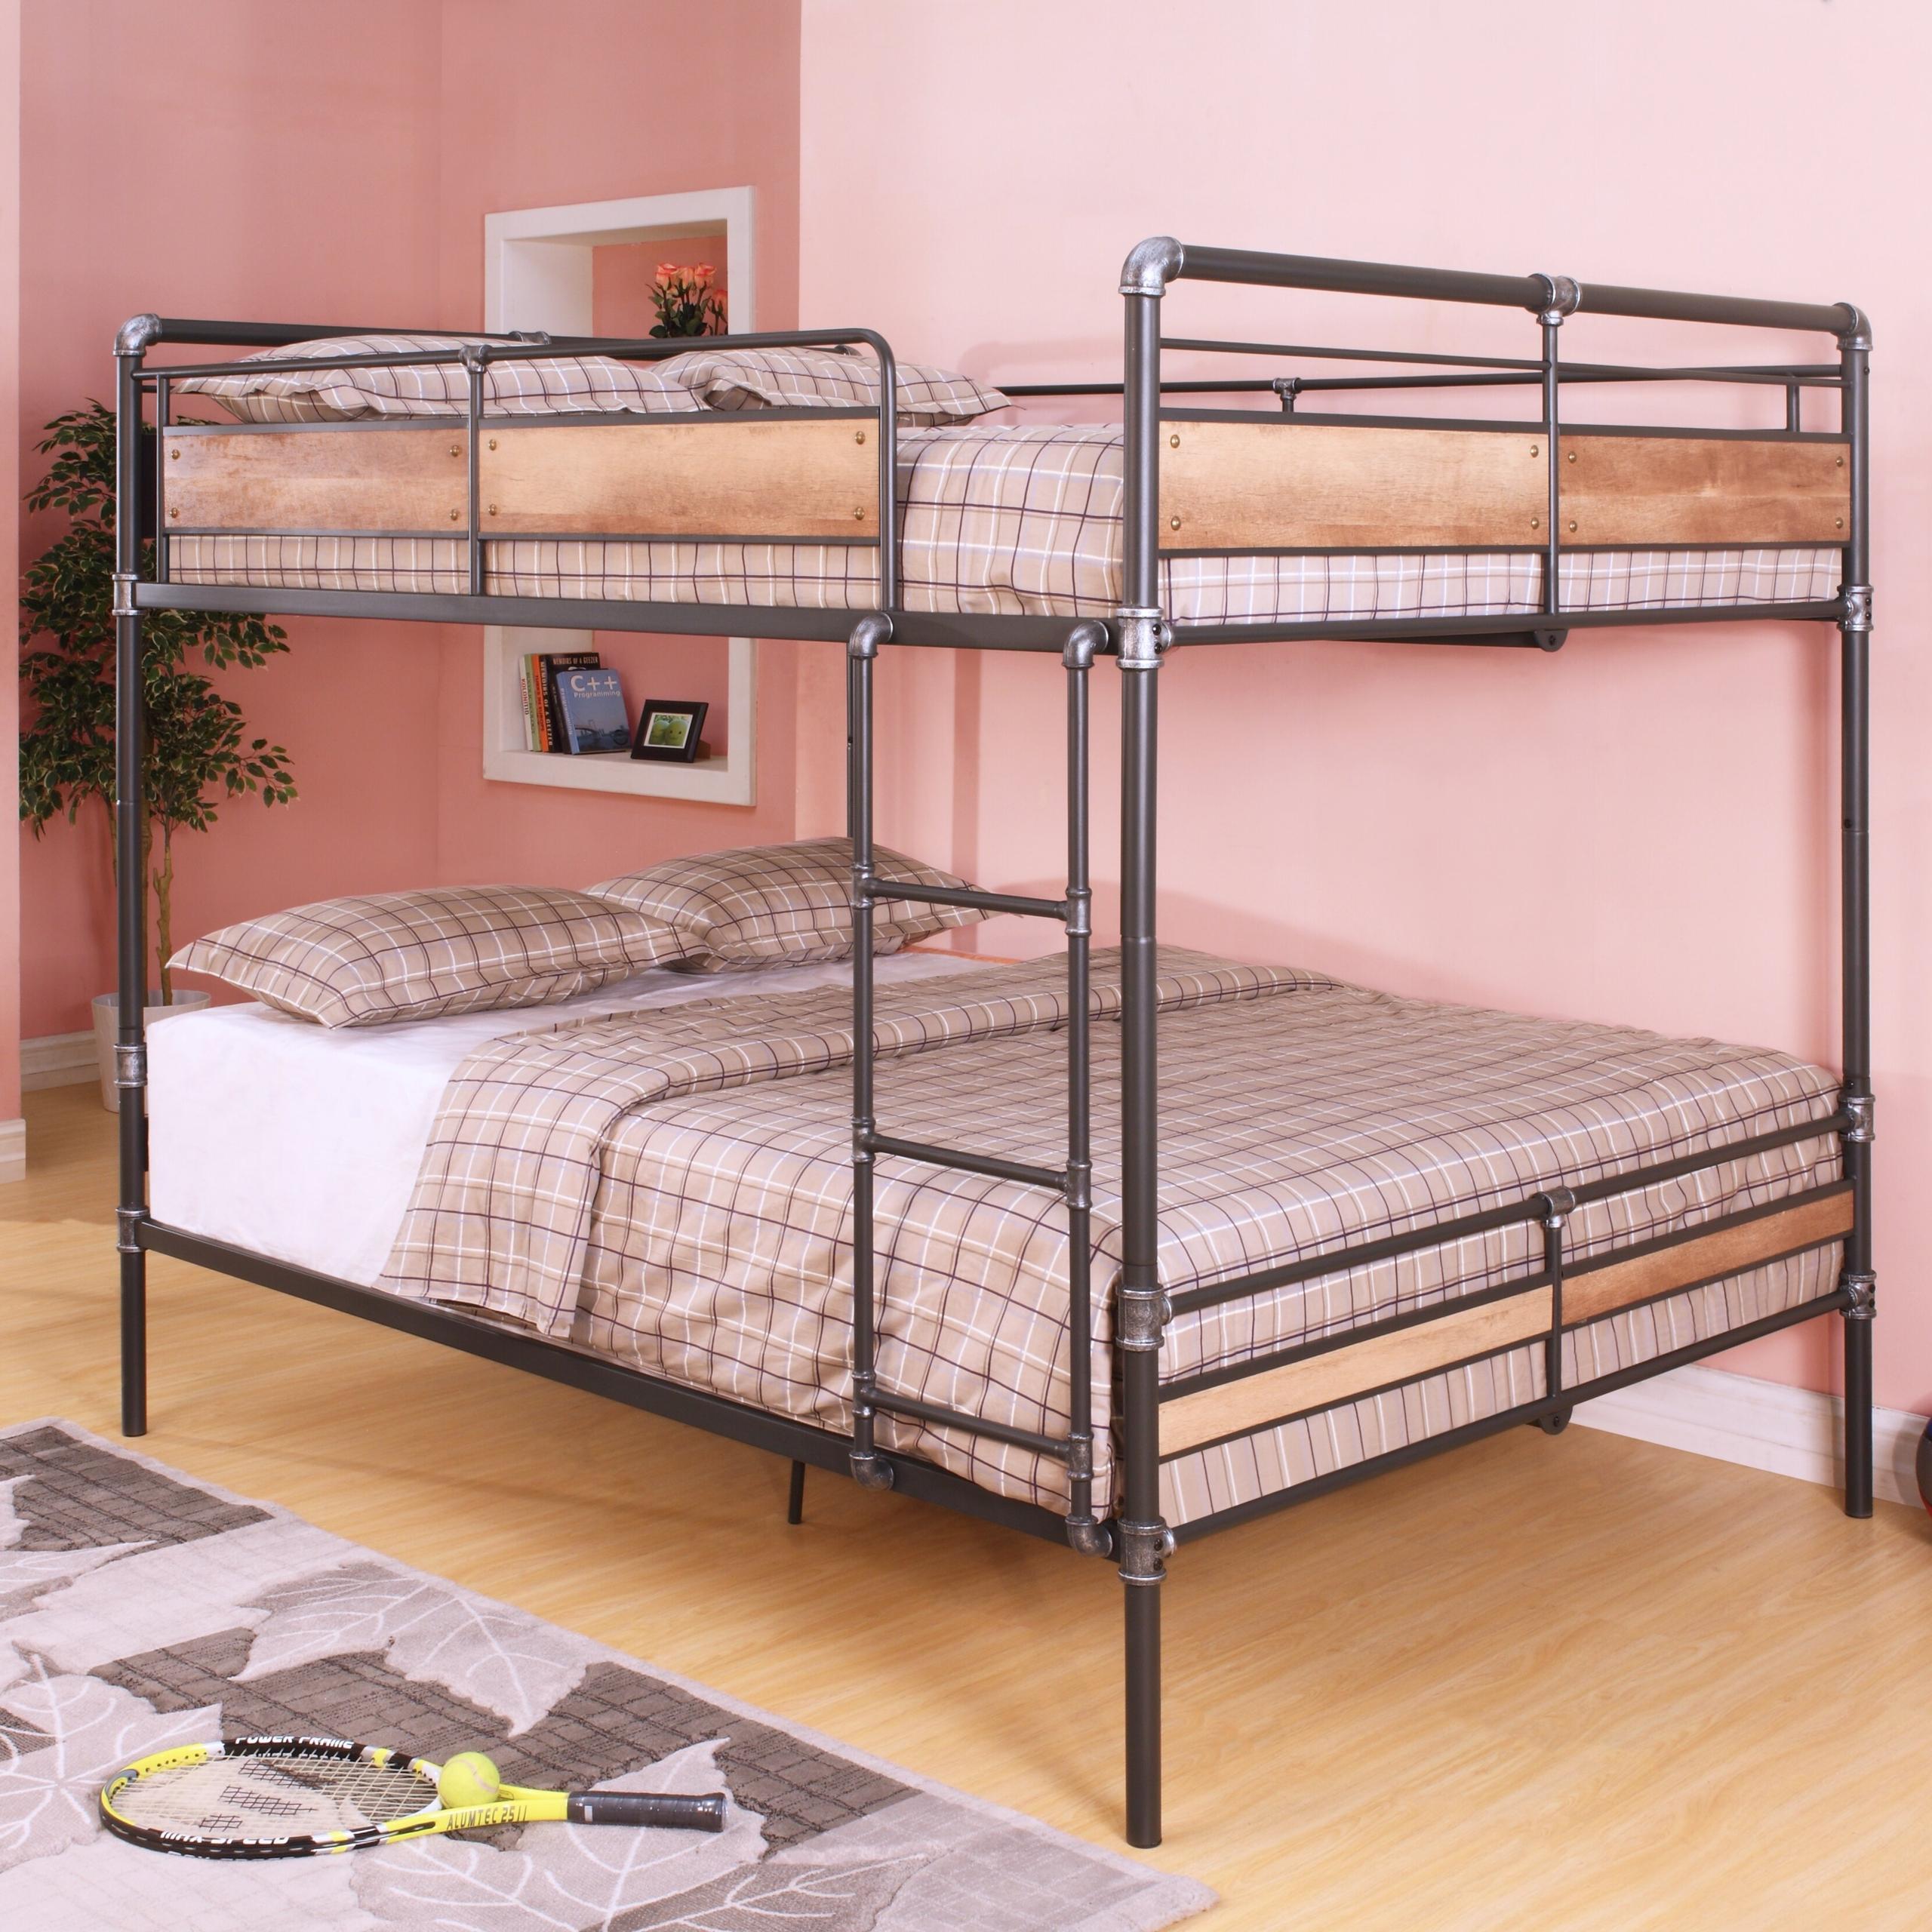 Heavy Duty Bunk Beds You Ll Love In, Queen Over Loft Bed